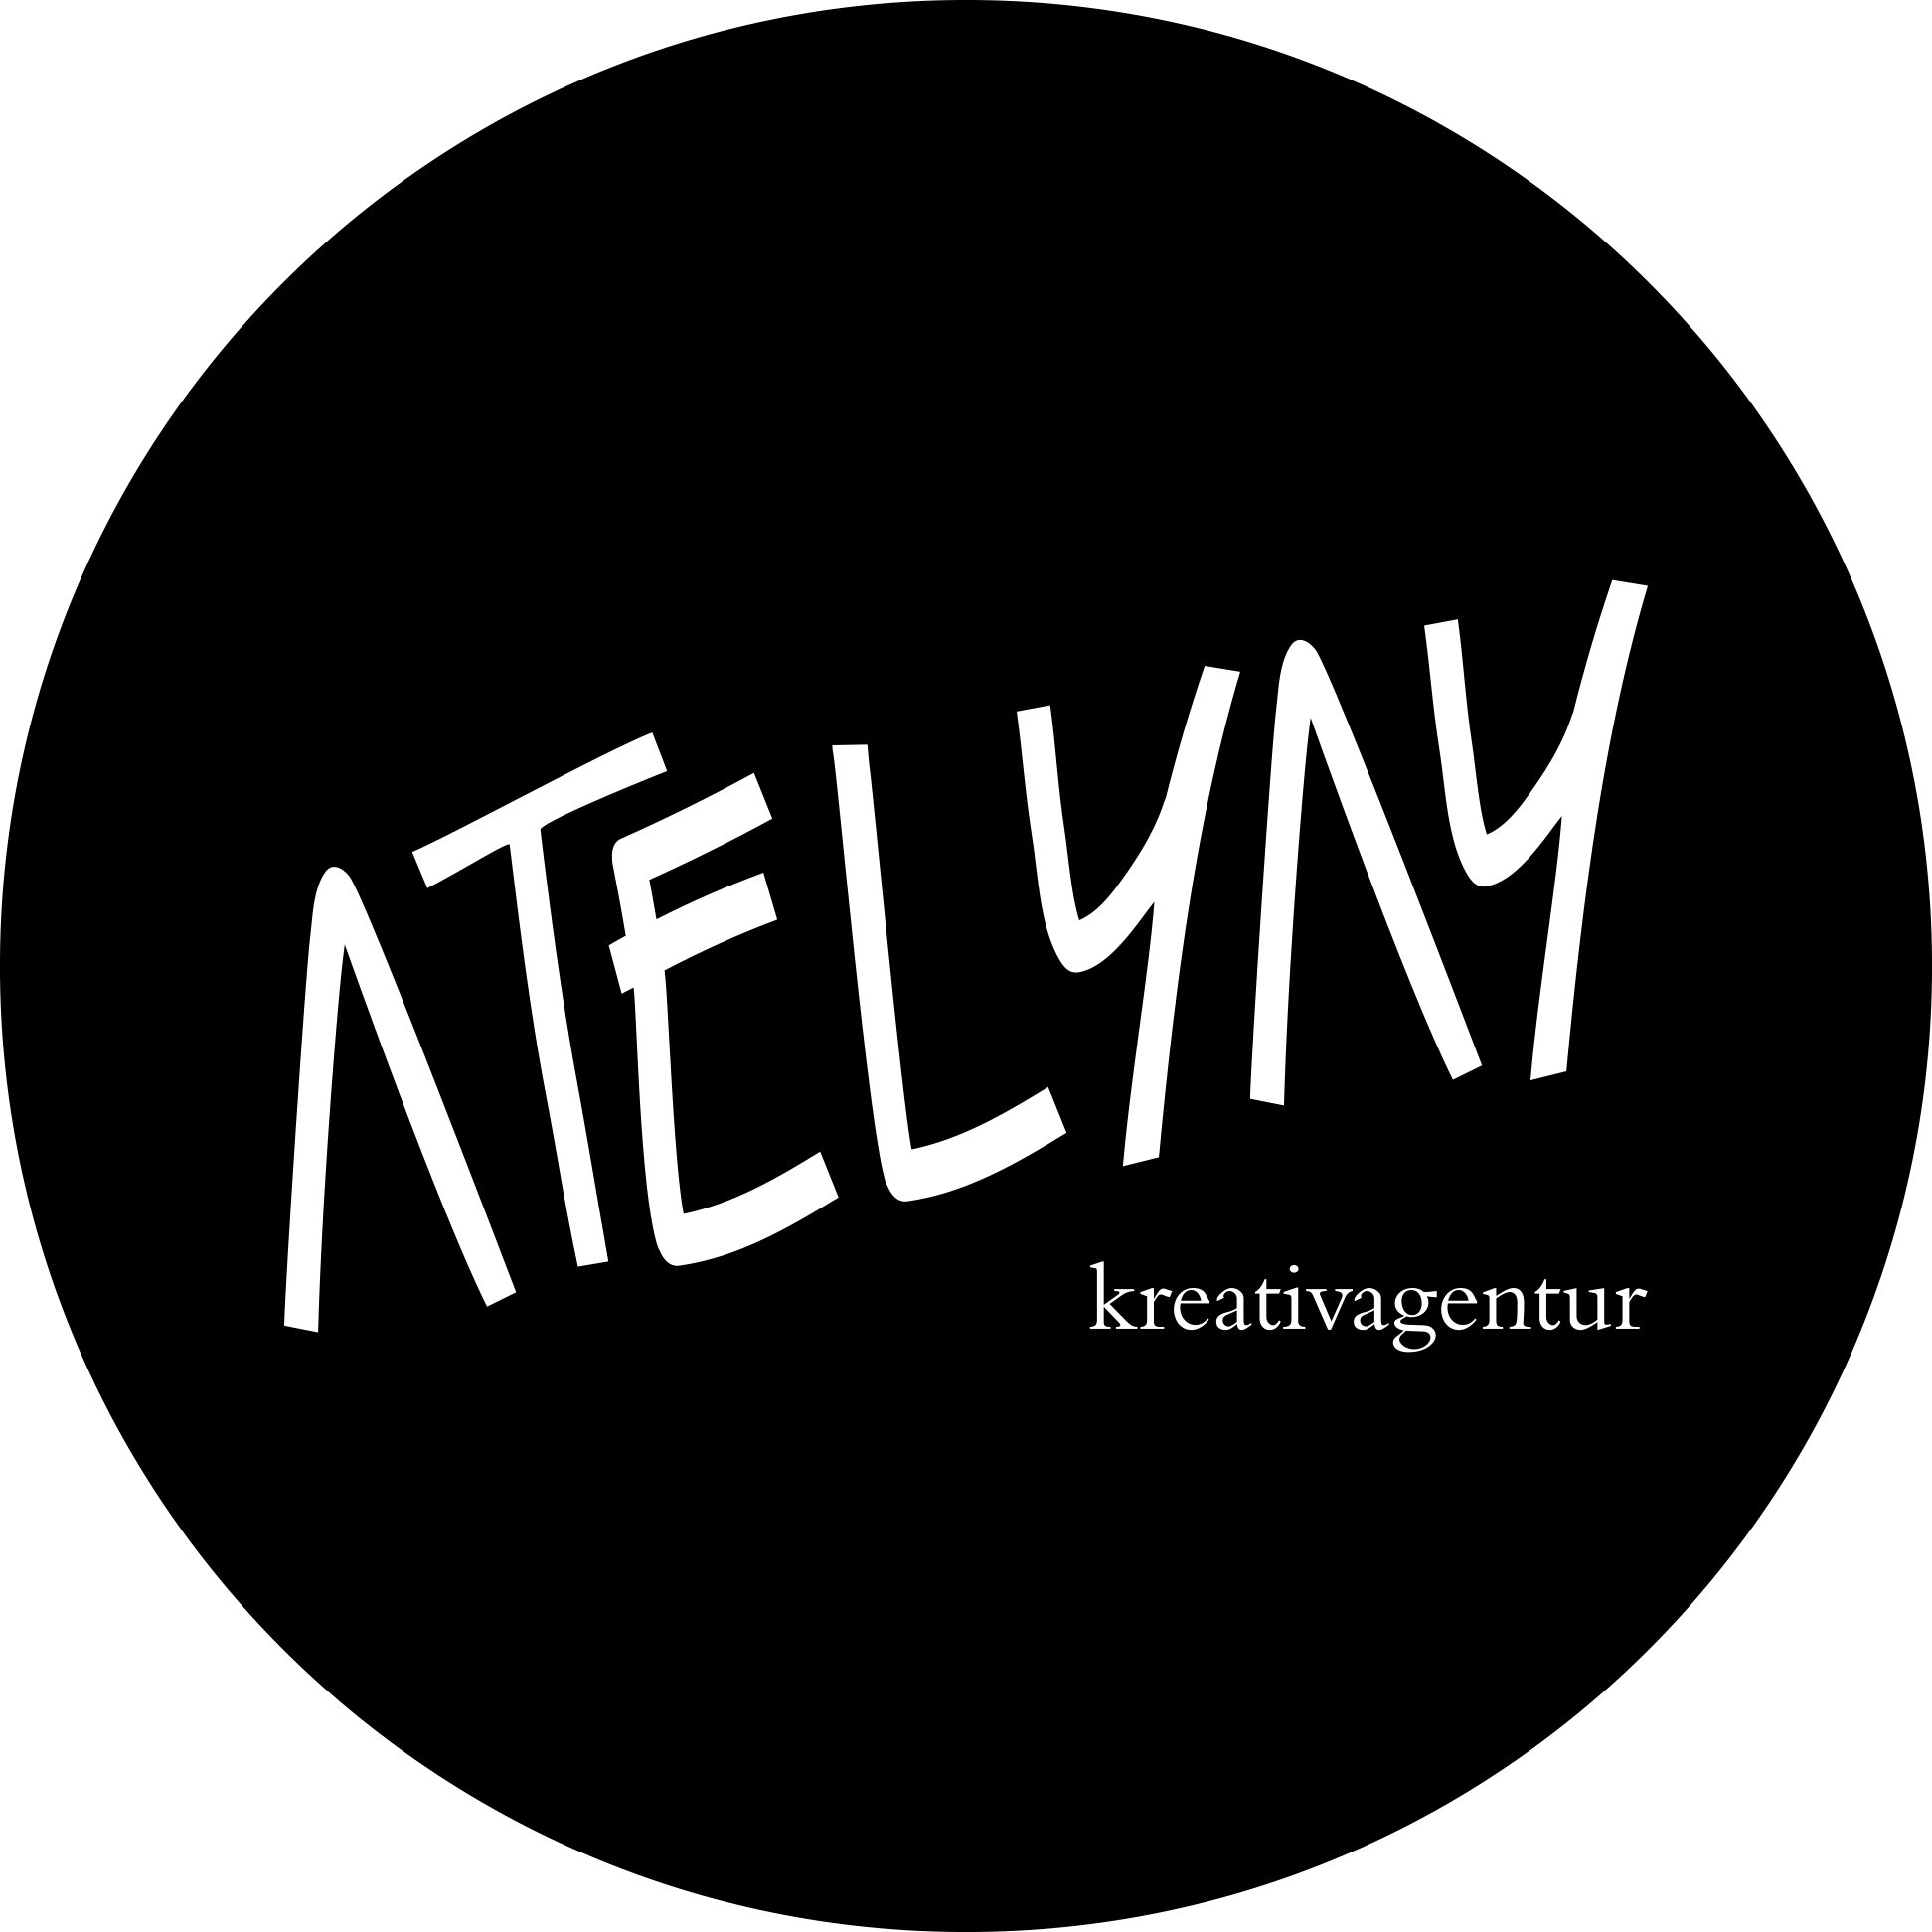 ATELYAY kreativagentur Wien Logo